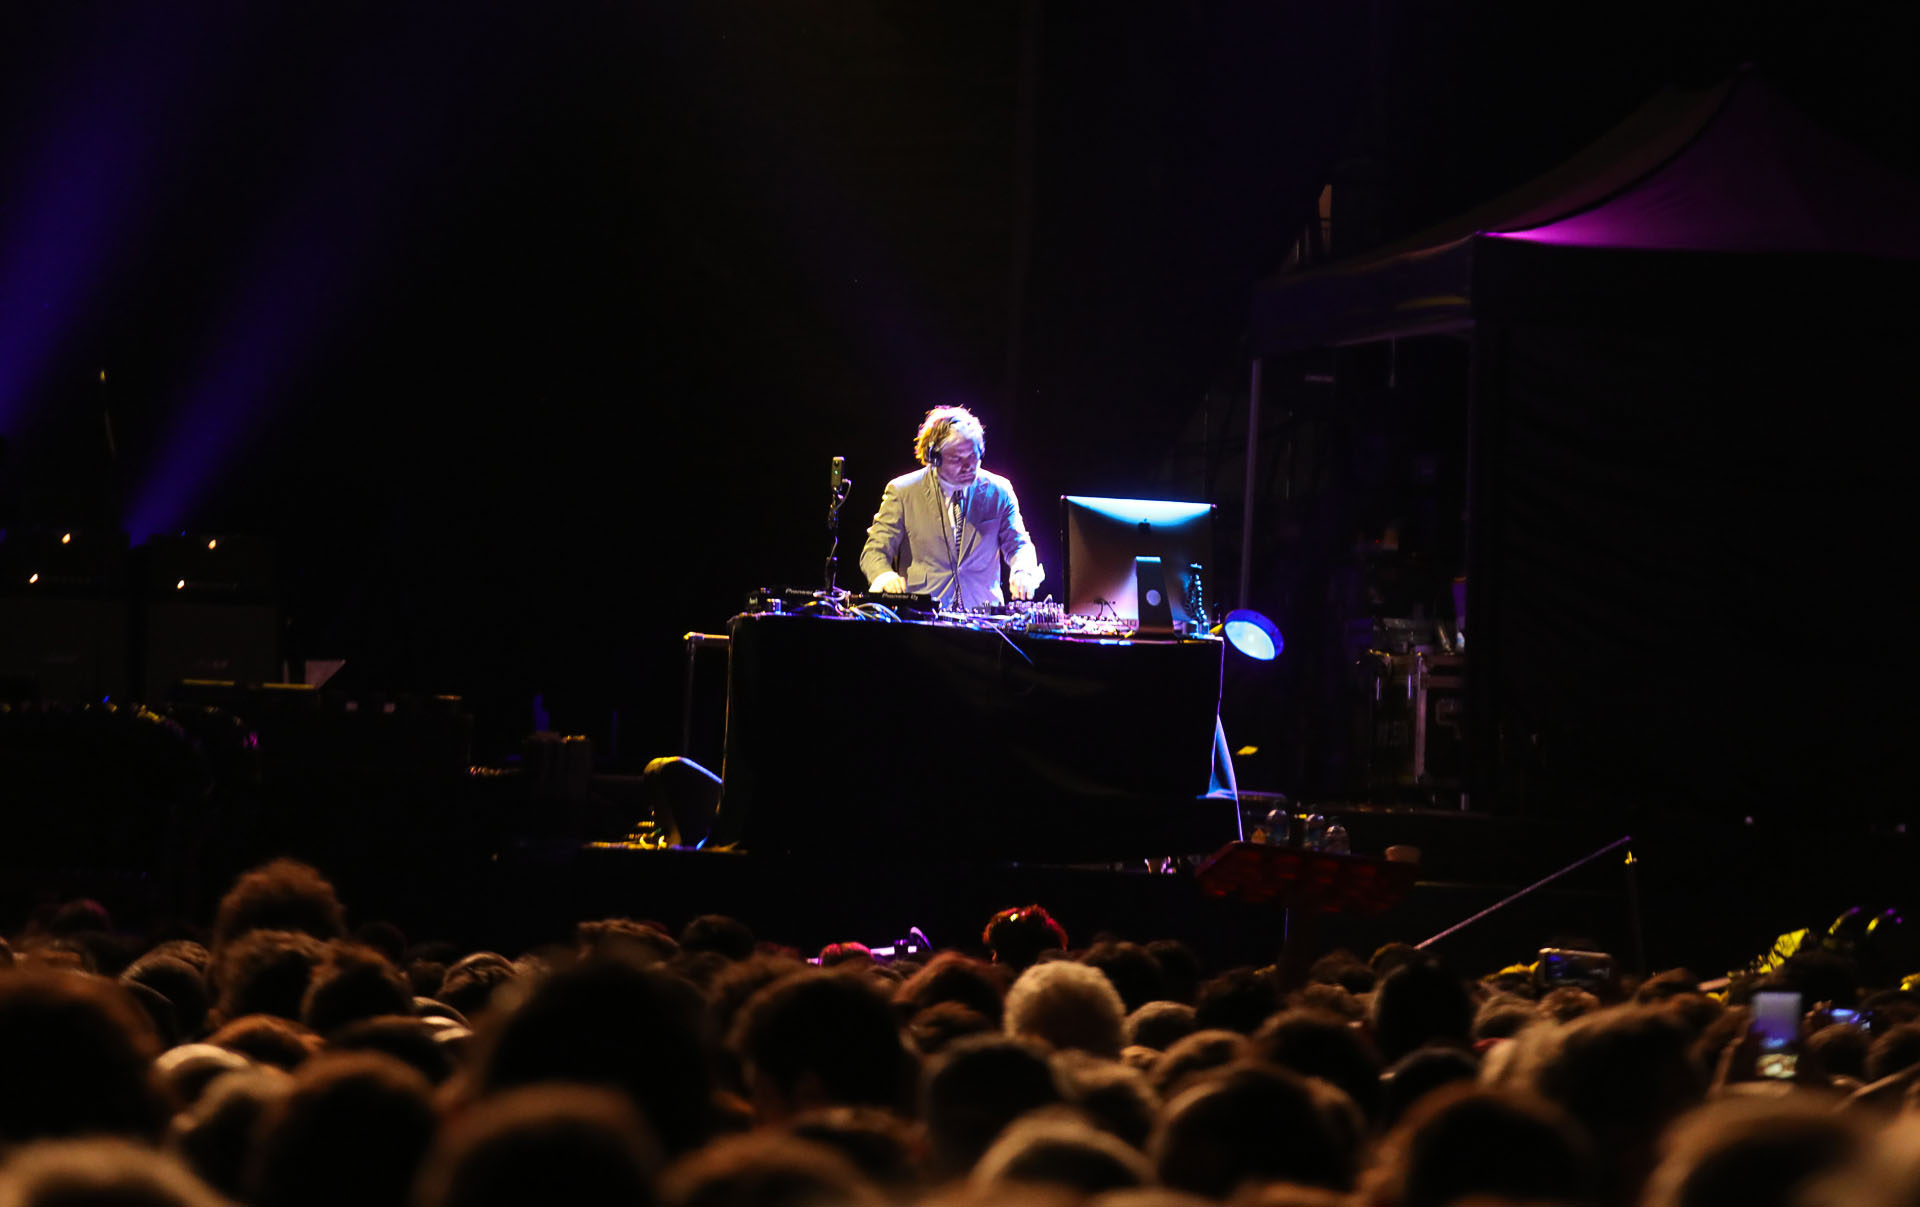 DJ Cris se presentó desde las consolas (Christian Bochichio / Teleshow)